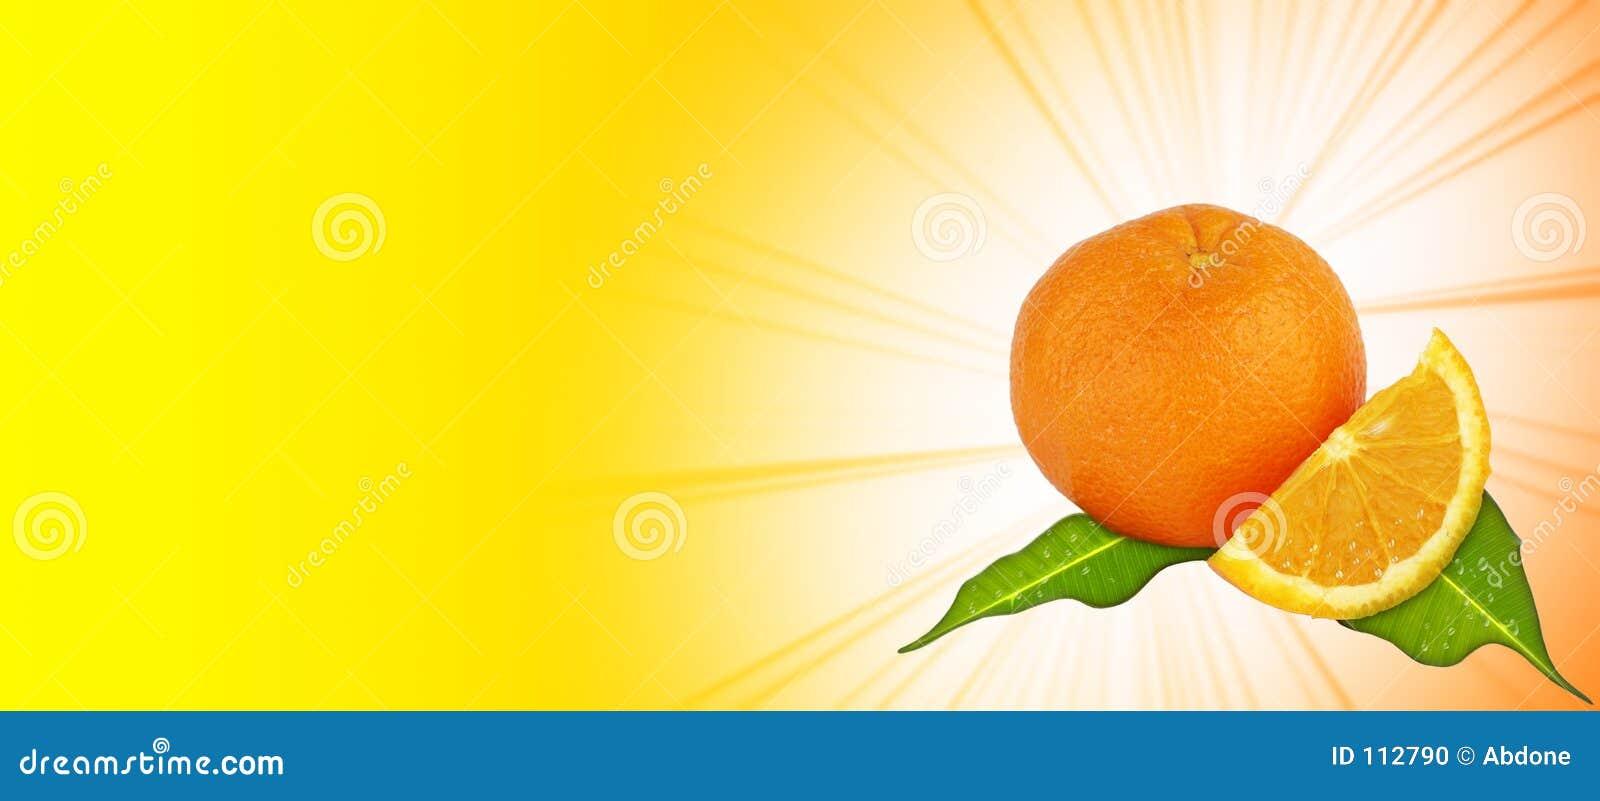 Orange - yellow background